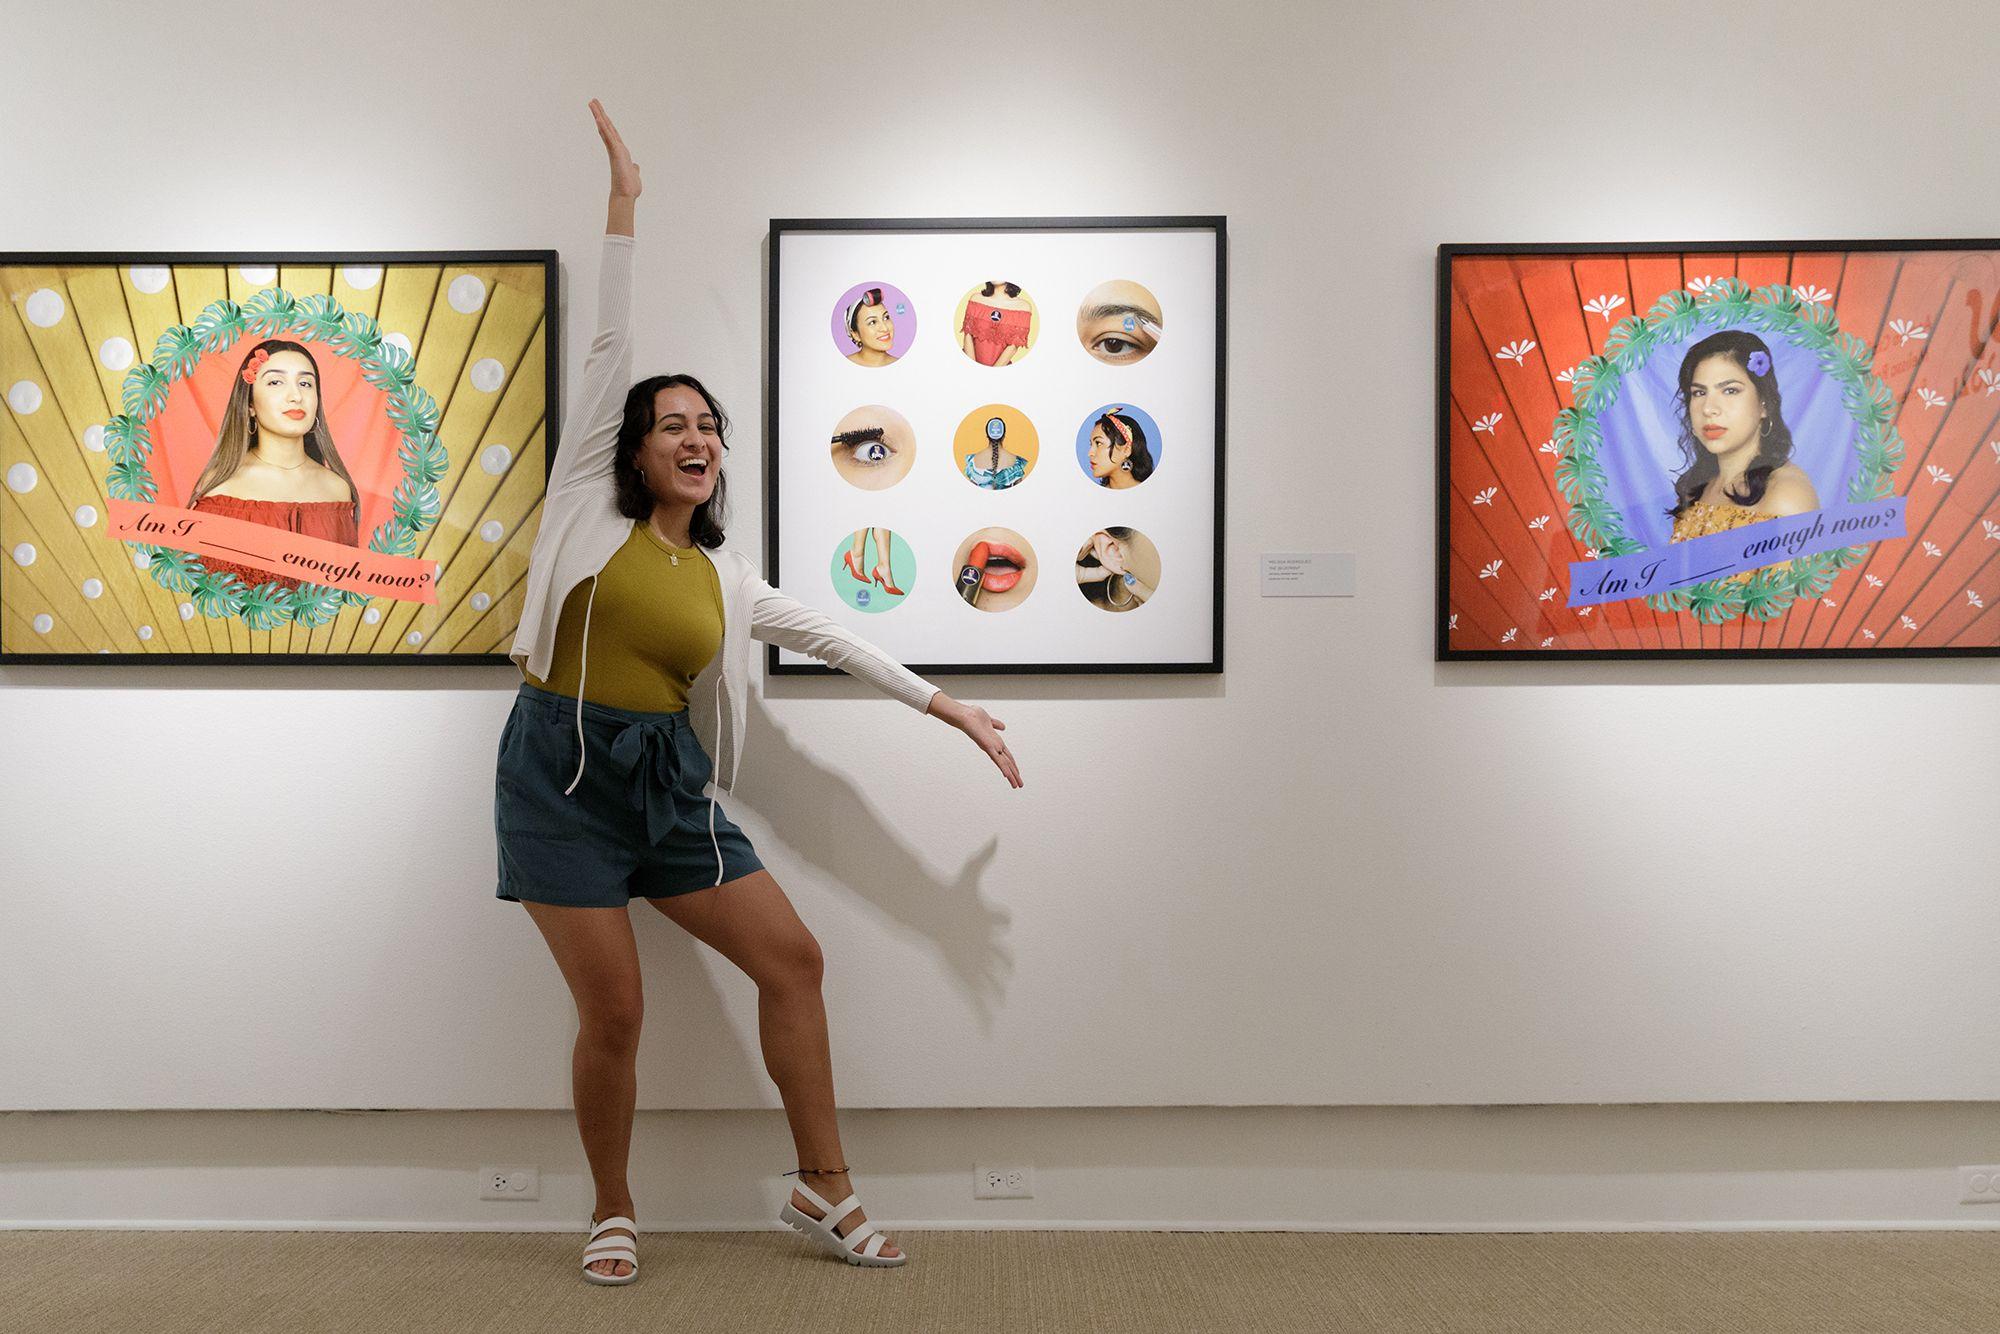 Studio art major Melissa Rodriguez '21 pictured with her original artwork at Rollins' Cornell Fine Arts Museum.